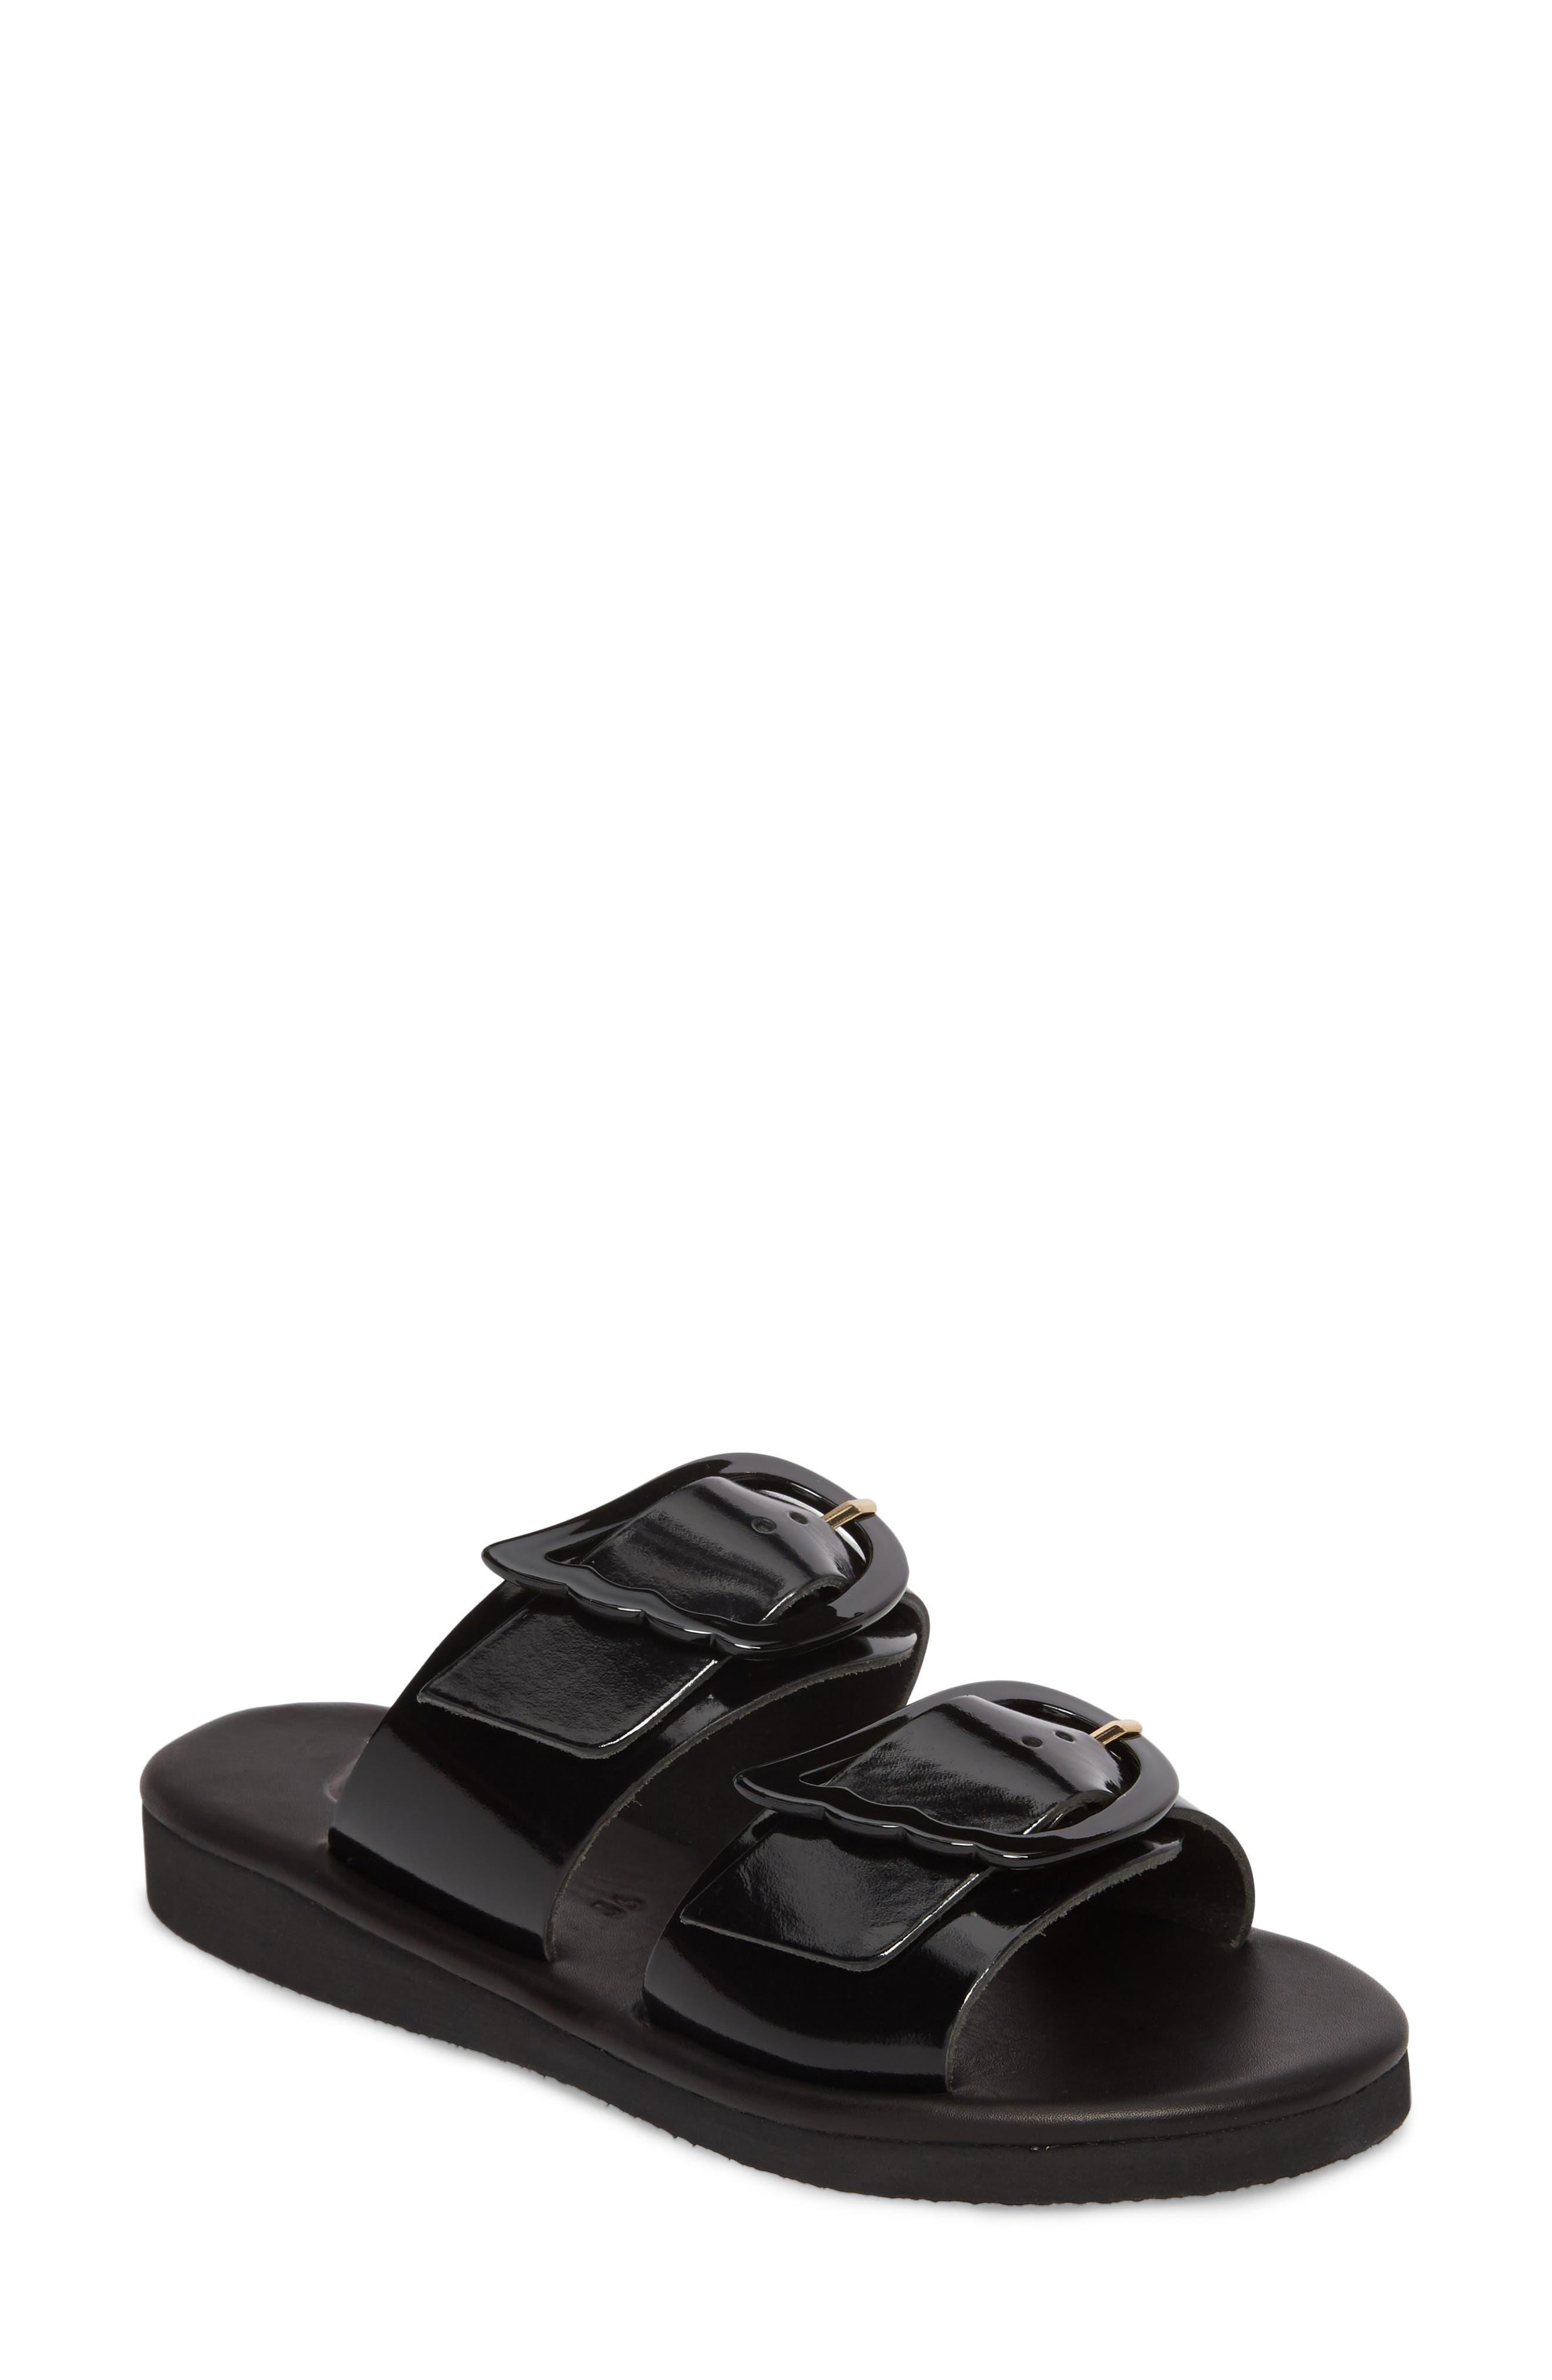 Alternate Image 1 Selected - Ancient Greek Sandals Iaso Slide Sandal (Women)